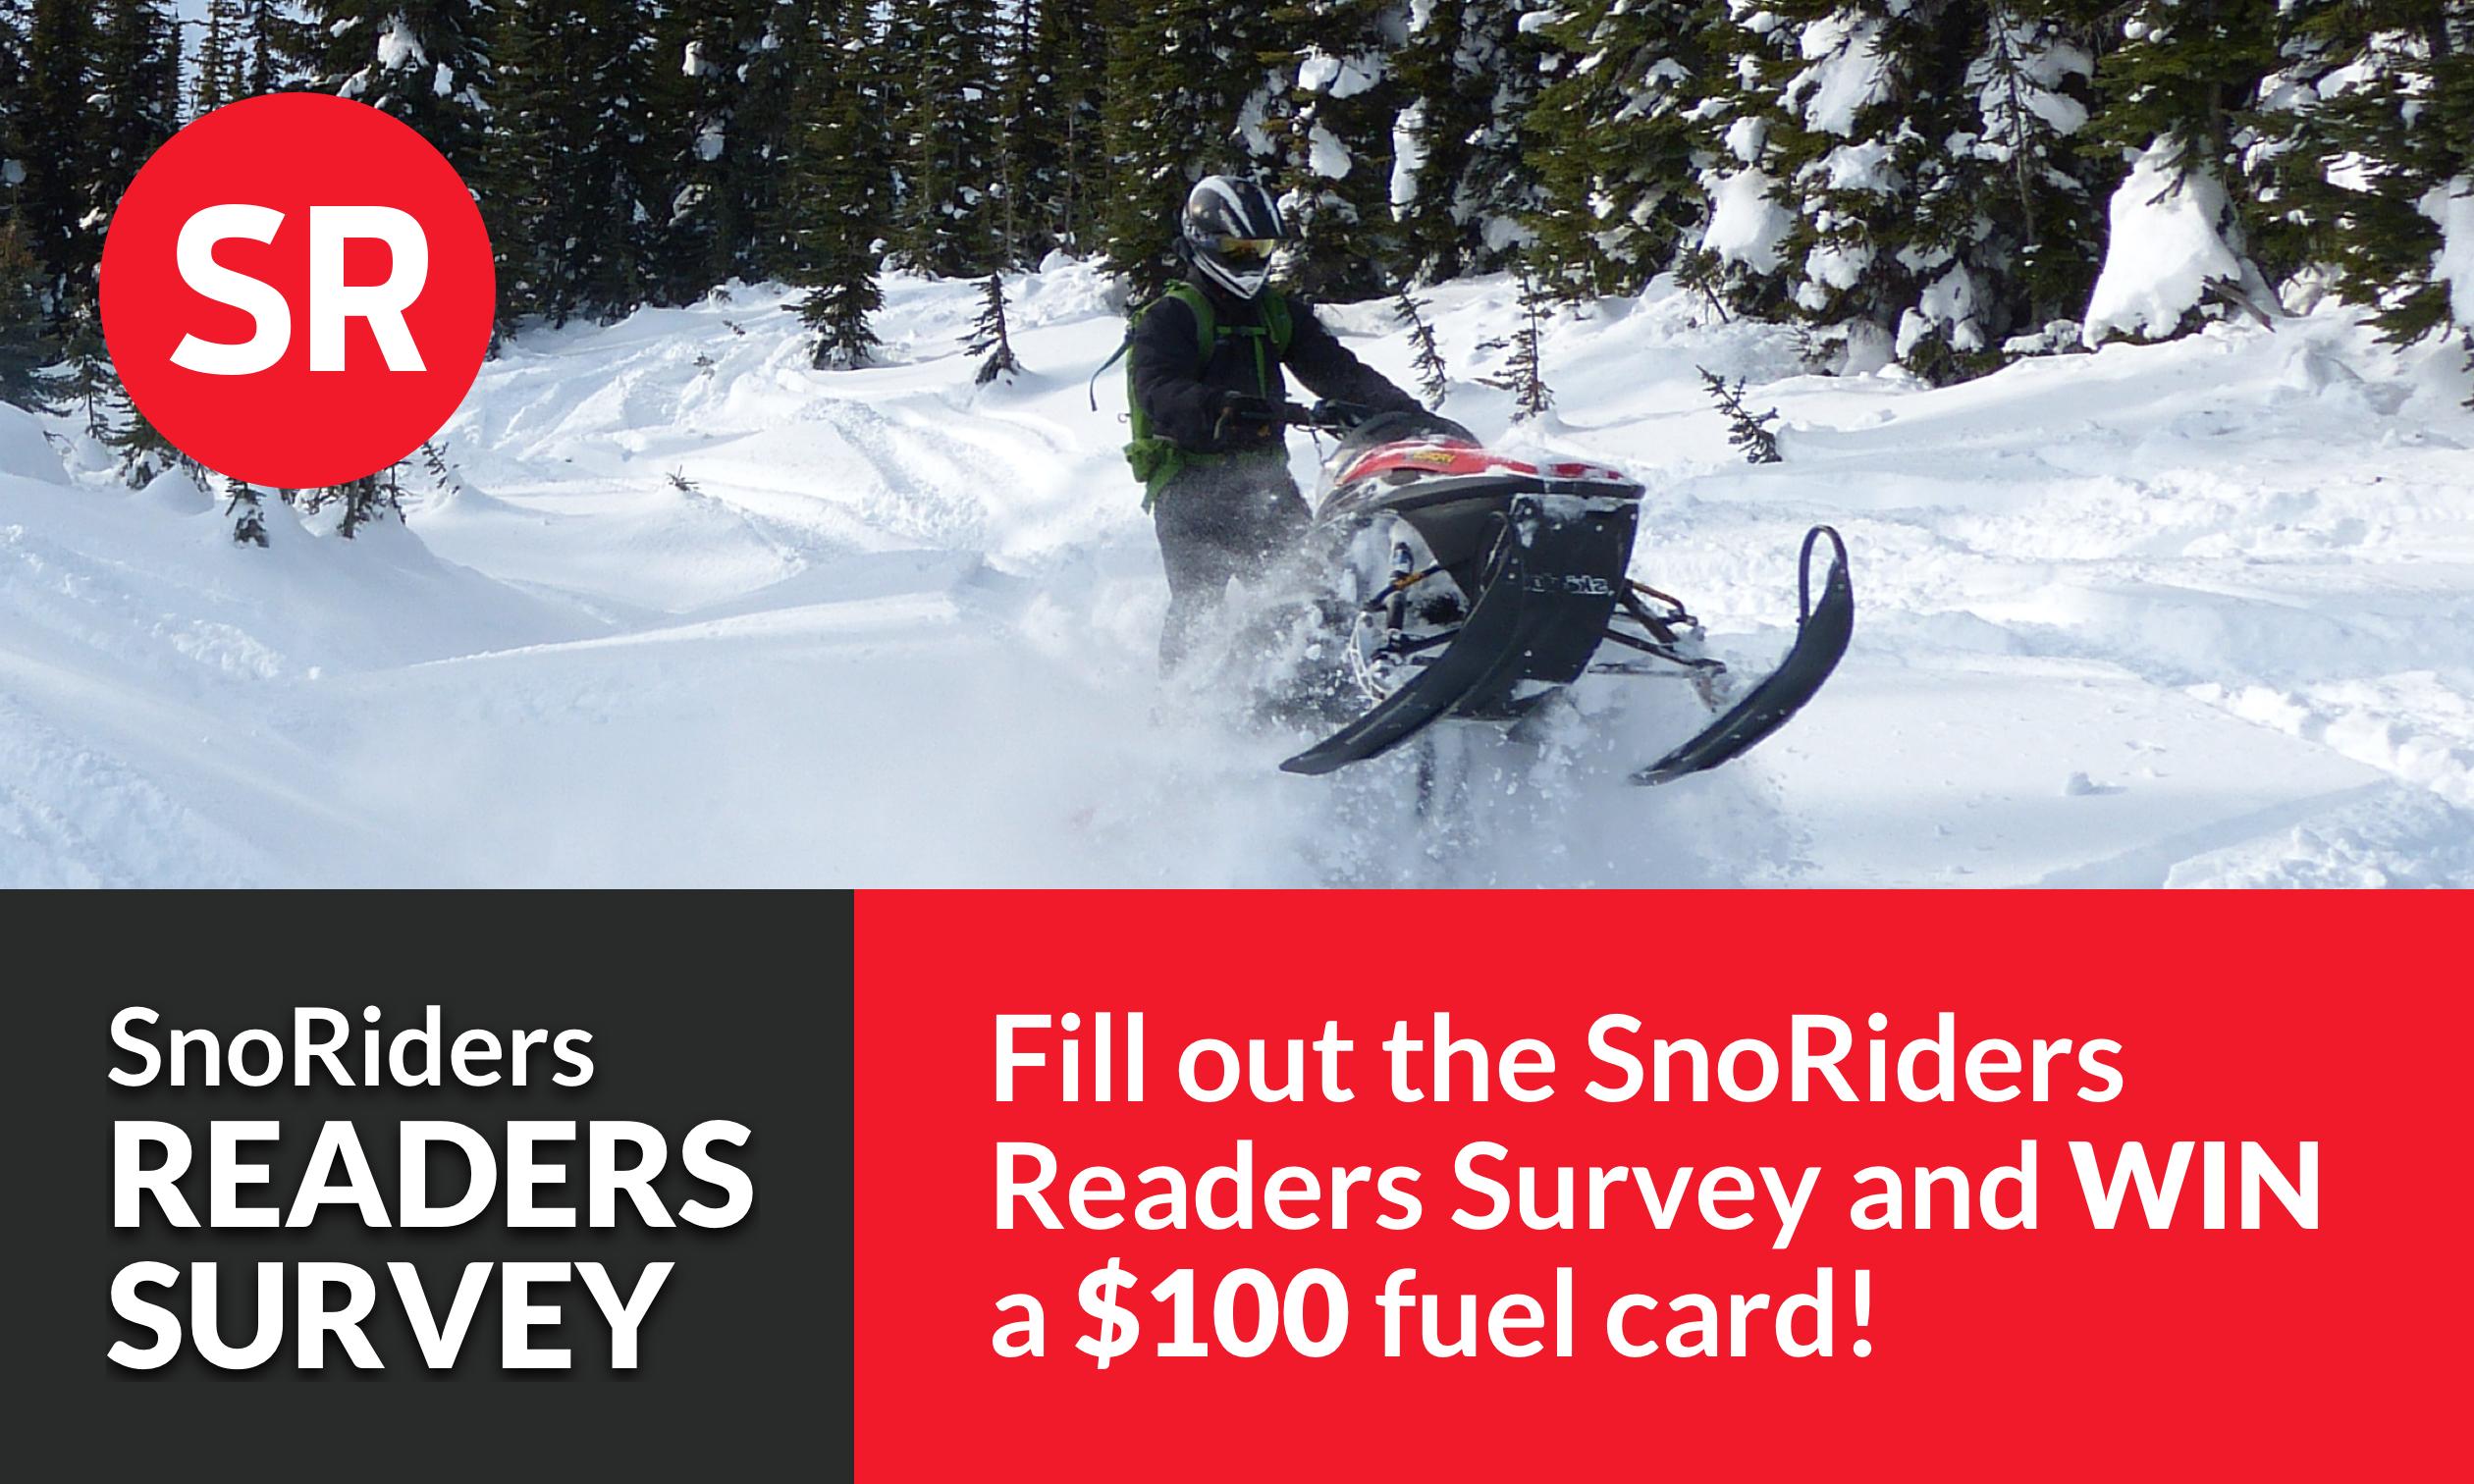 Take the SnoRiders Readers Survey